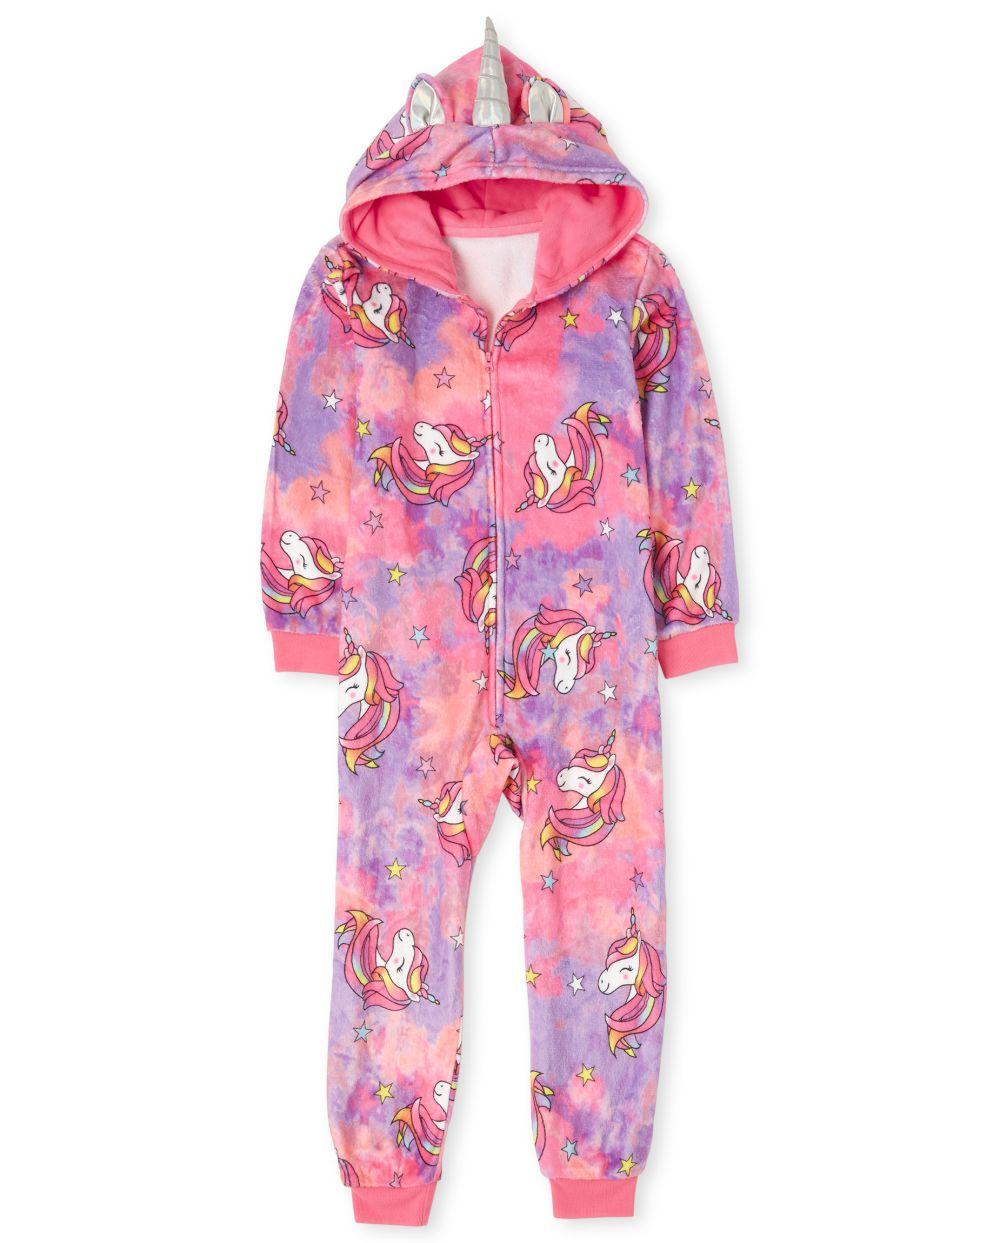 Girls Mommy And Me Unicorn Tie Dye Fleece Matching One Piece Pajamas